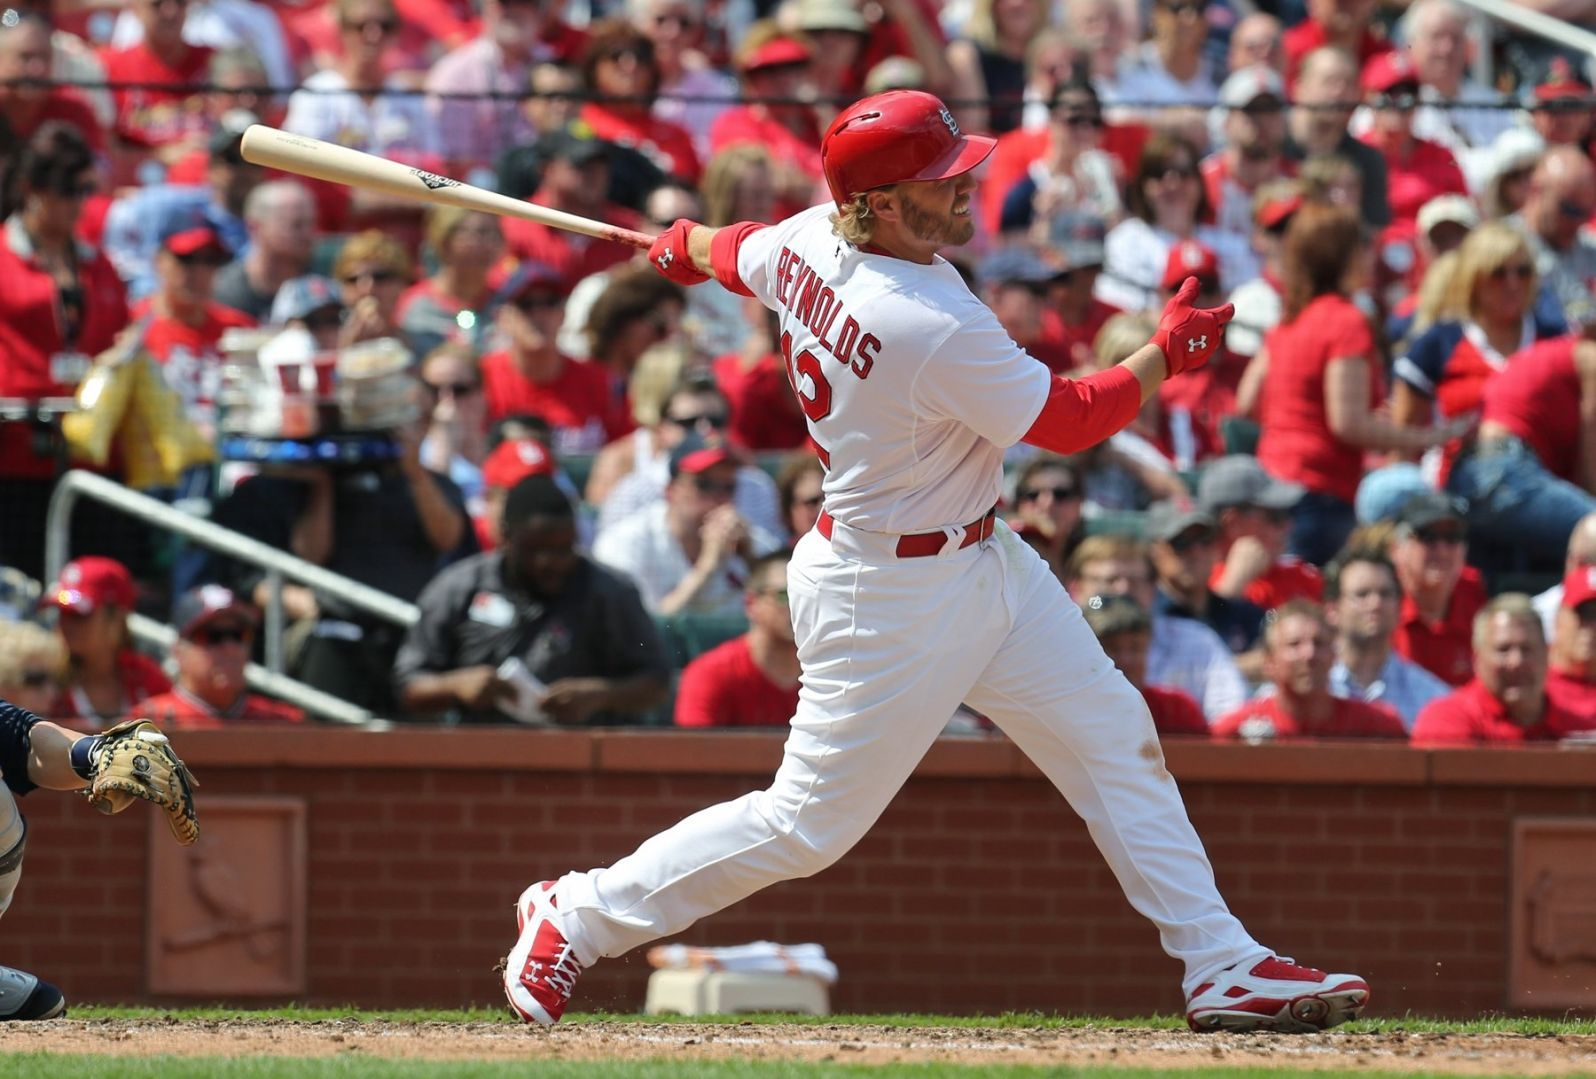 Reynolds enjoys big day for Cardinals